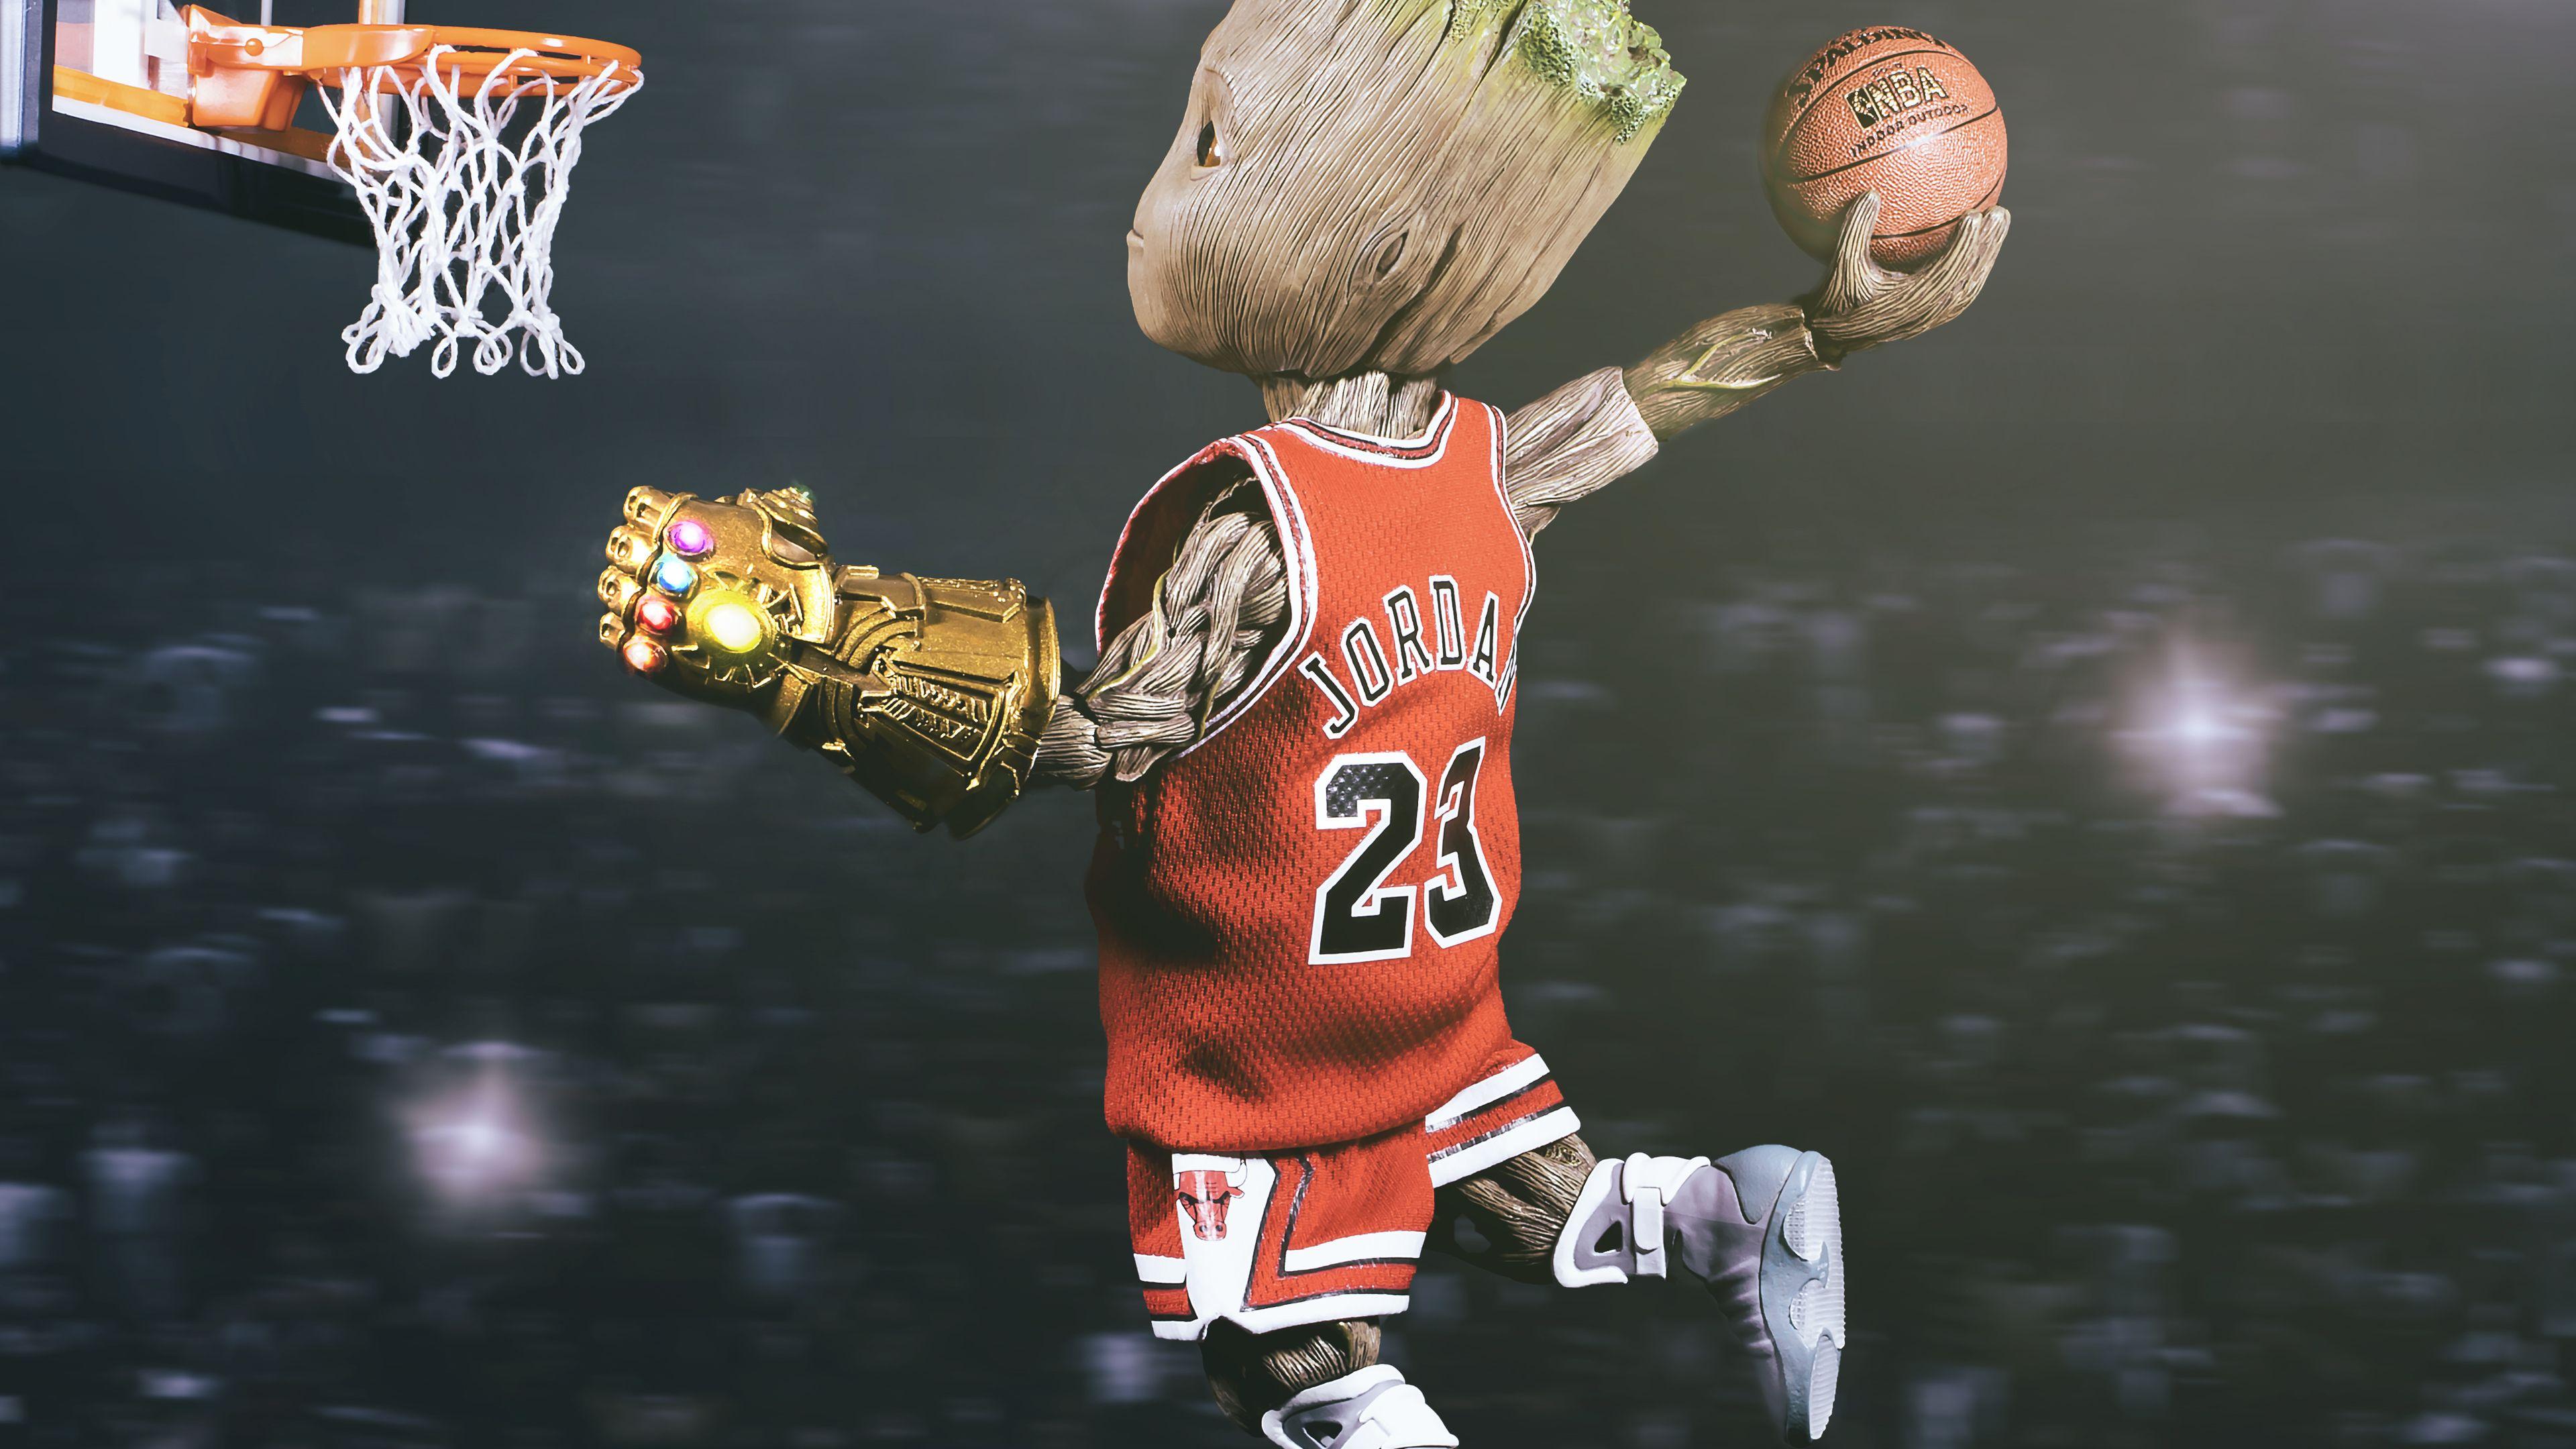 Baby Groot Playing Basketball superheroes wallpapers hd 3840x2160